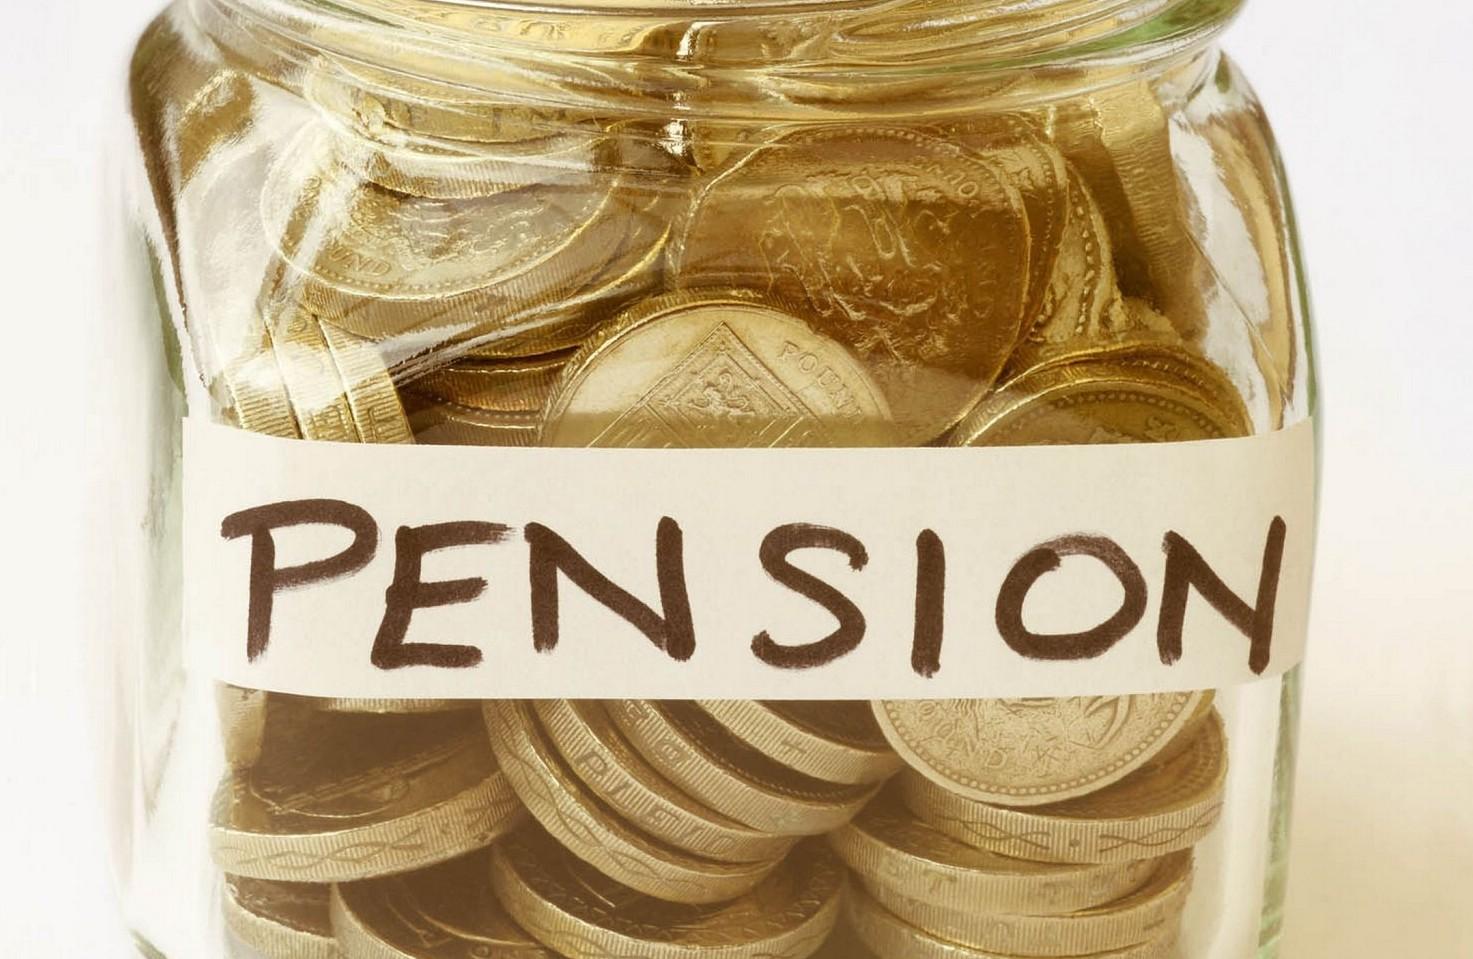 Pensioni ultime notizie usuranti chi spe